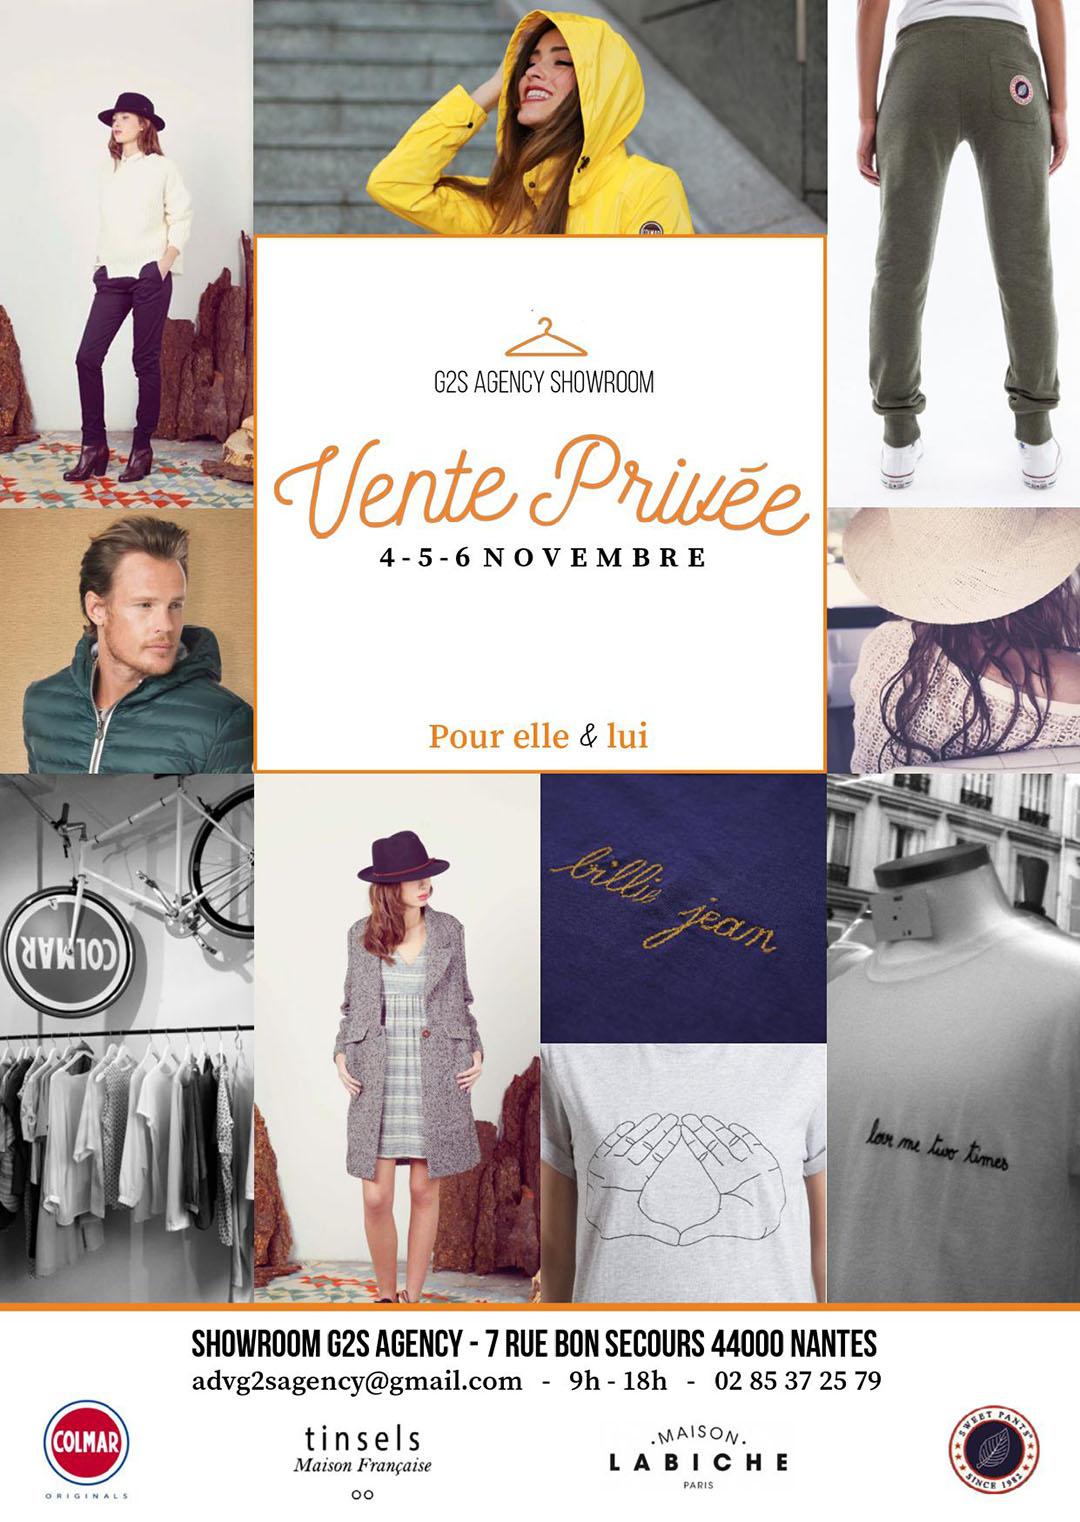 2_vente_privee_showroom_g2s_nantes_vide_dressing